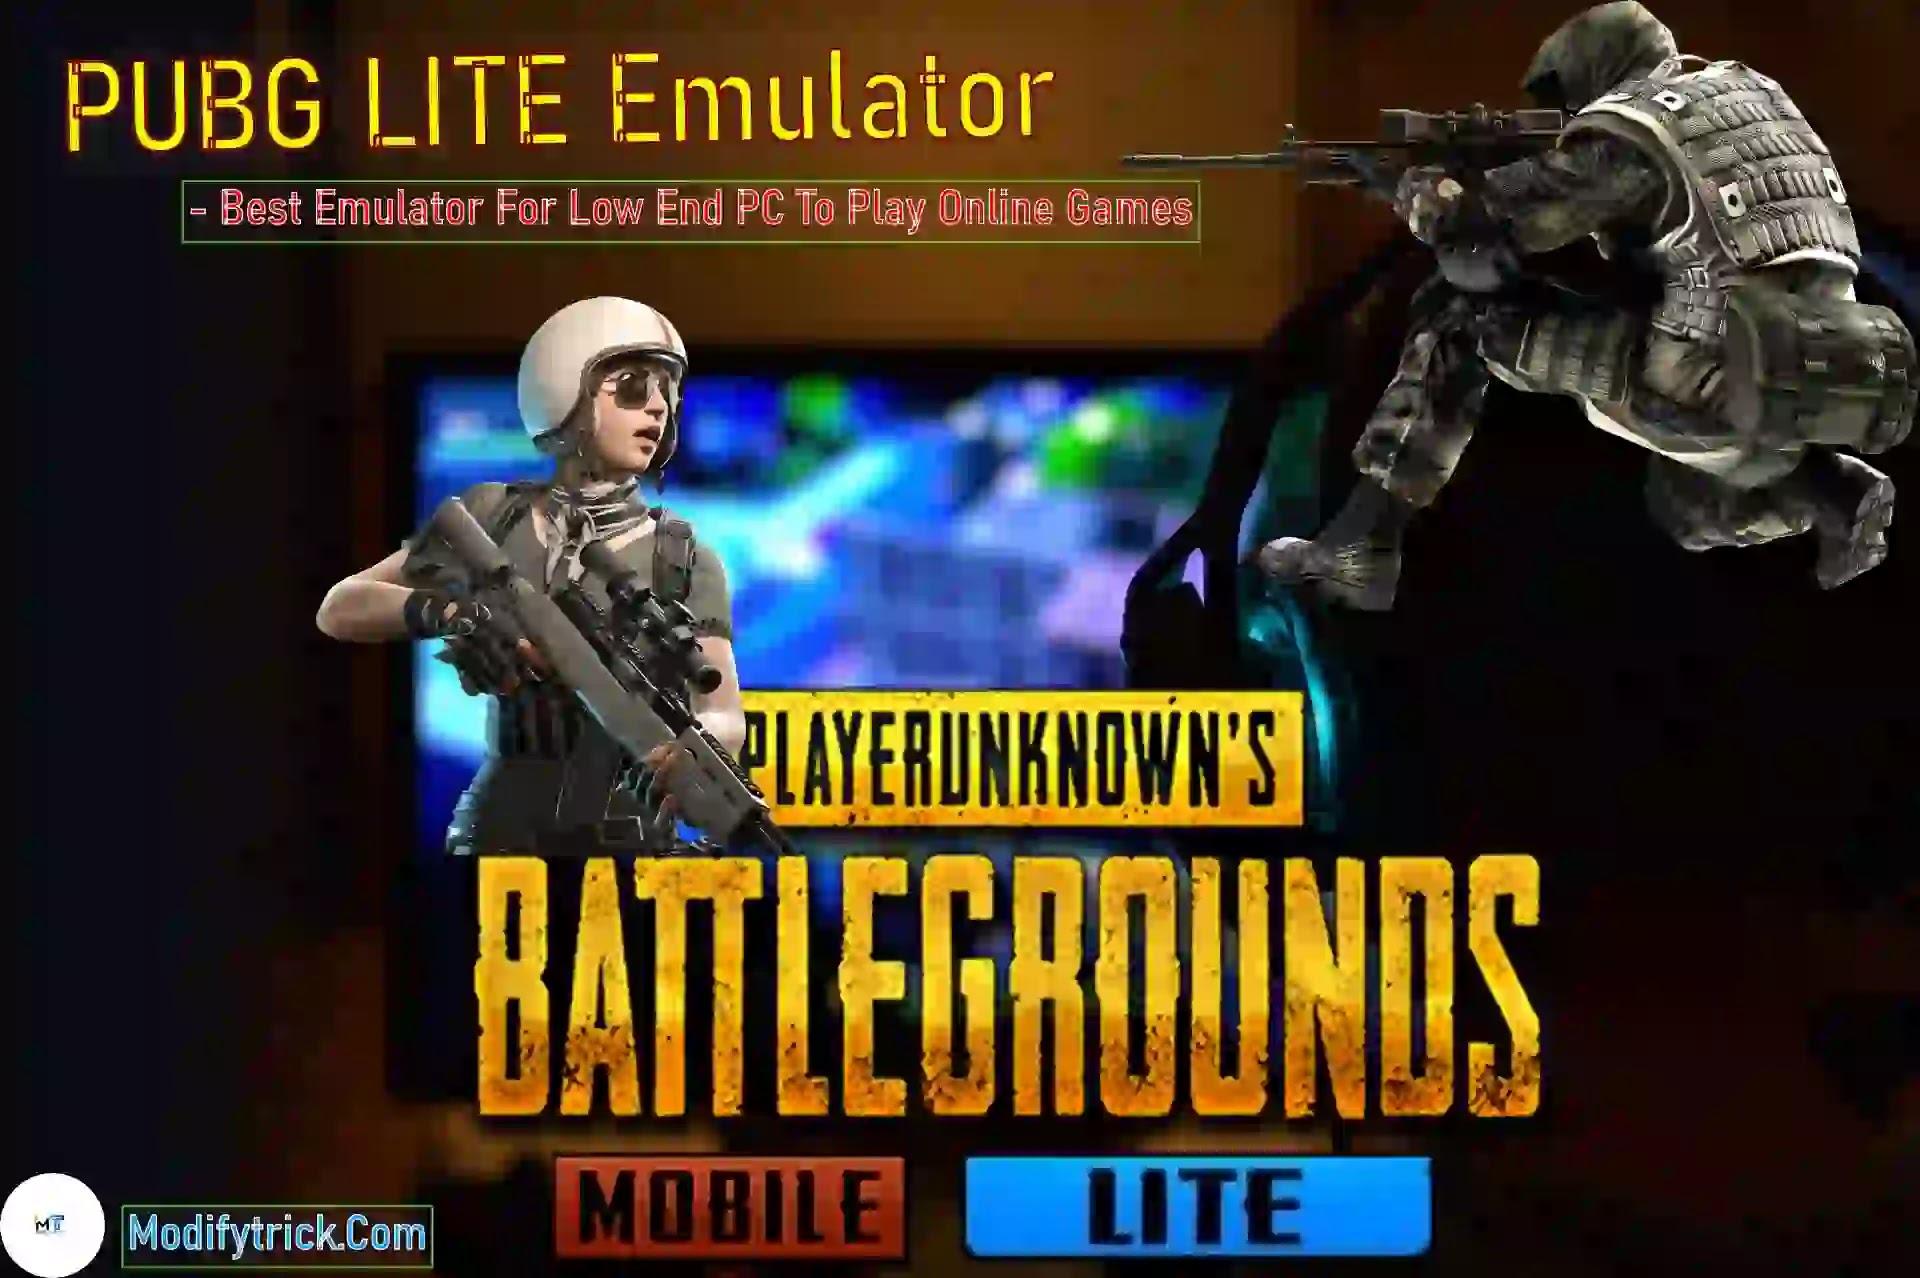 PUBG LITE Emulator